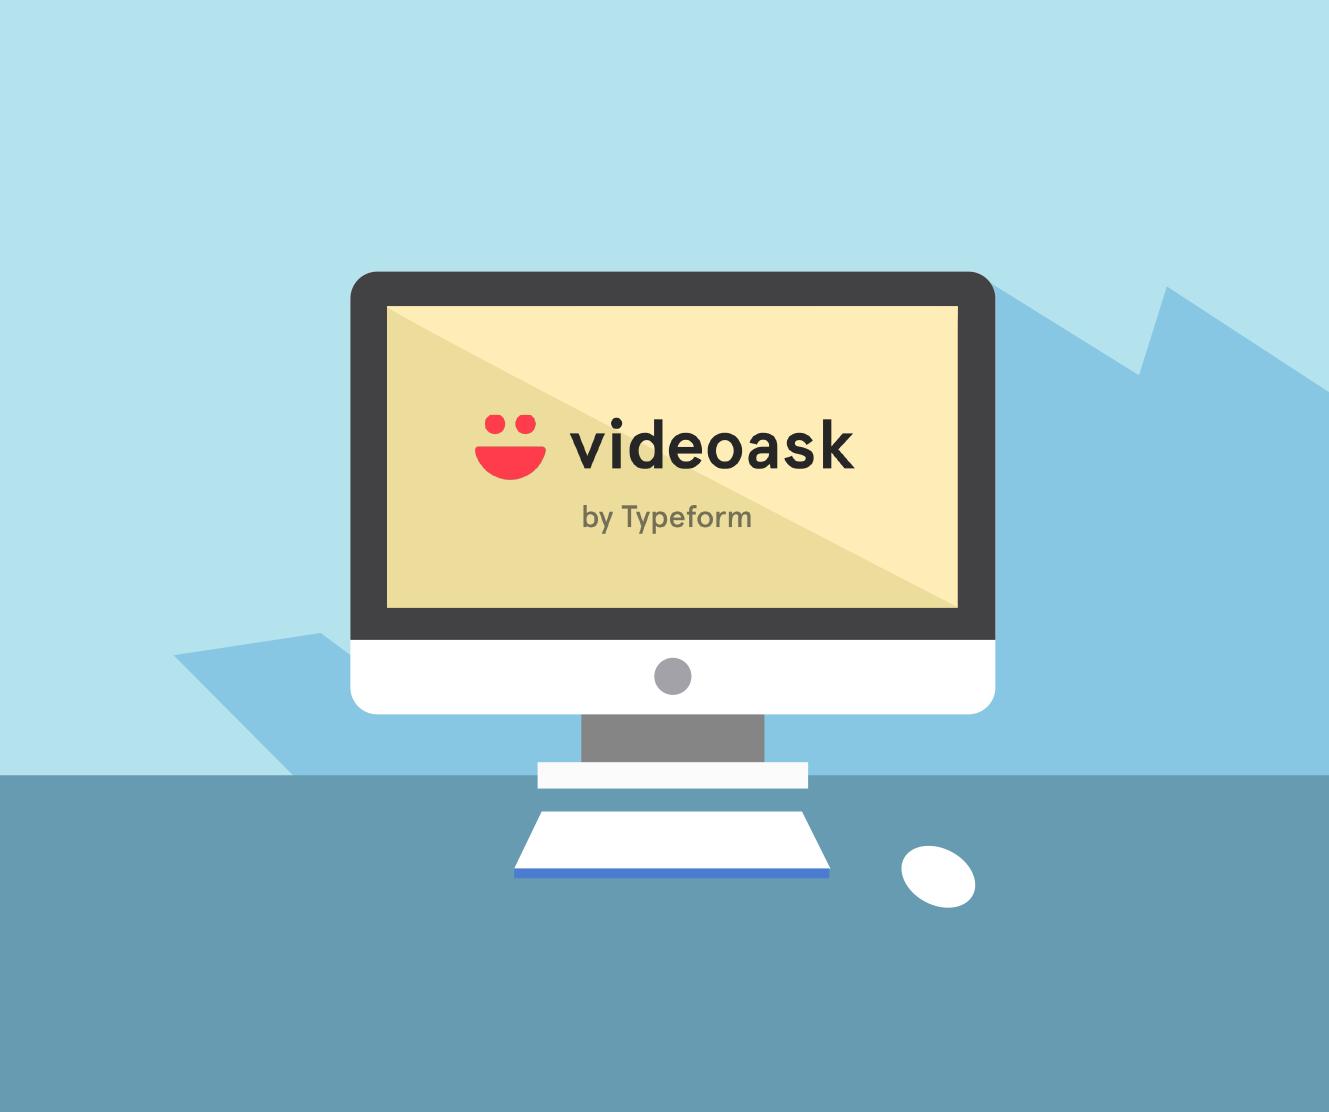 VideoAsk